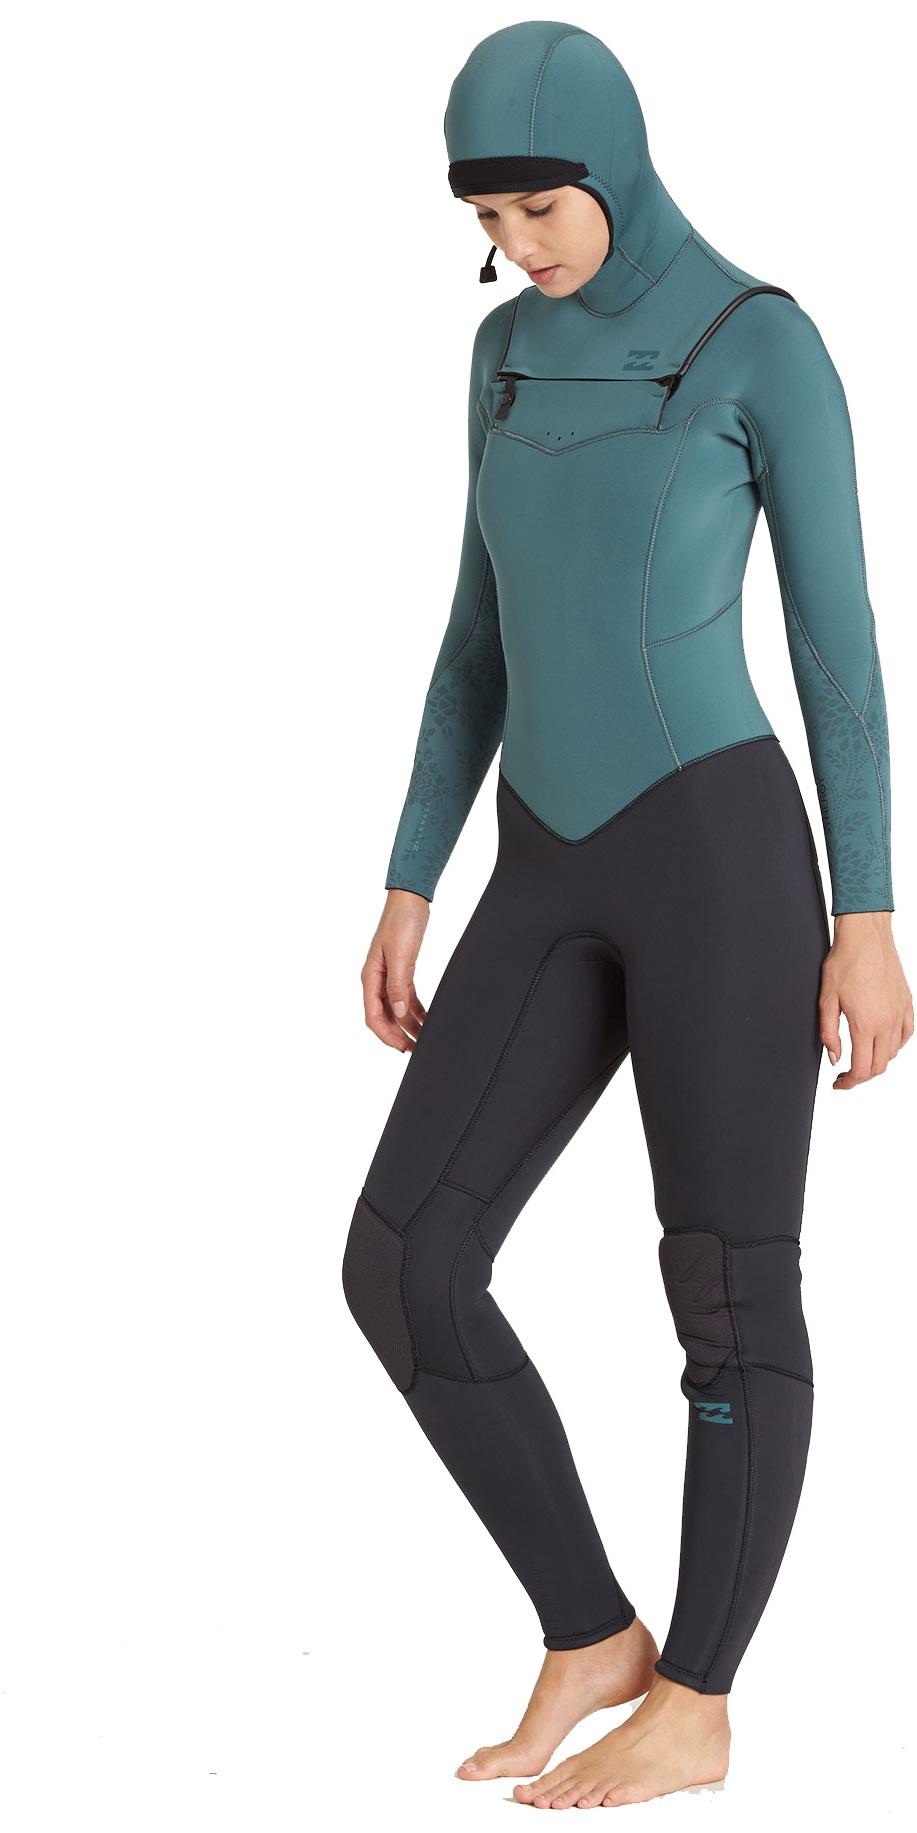 2018 Billabong Womens Furnace Synergy 5/4mm Hooded Chest Zip Wetsuit Sugar Pine L45G30